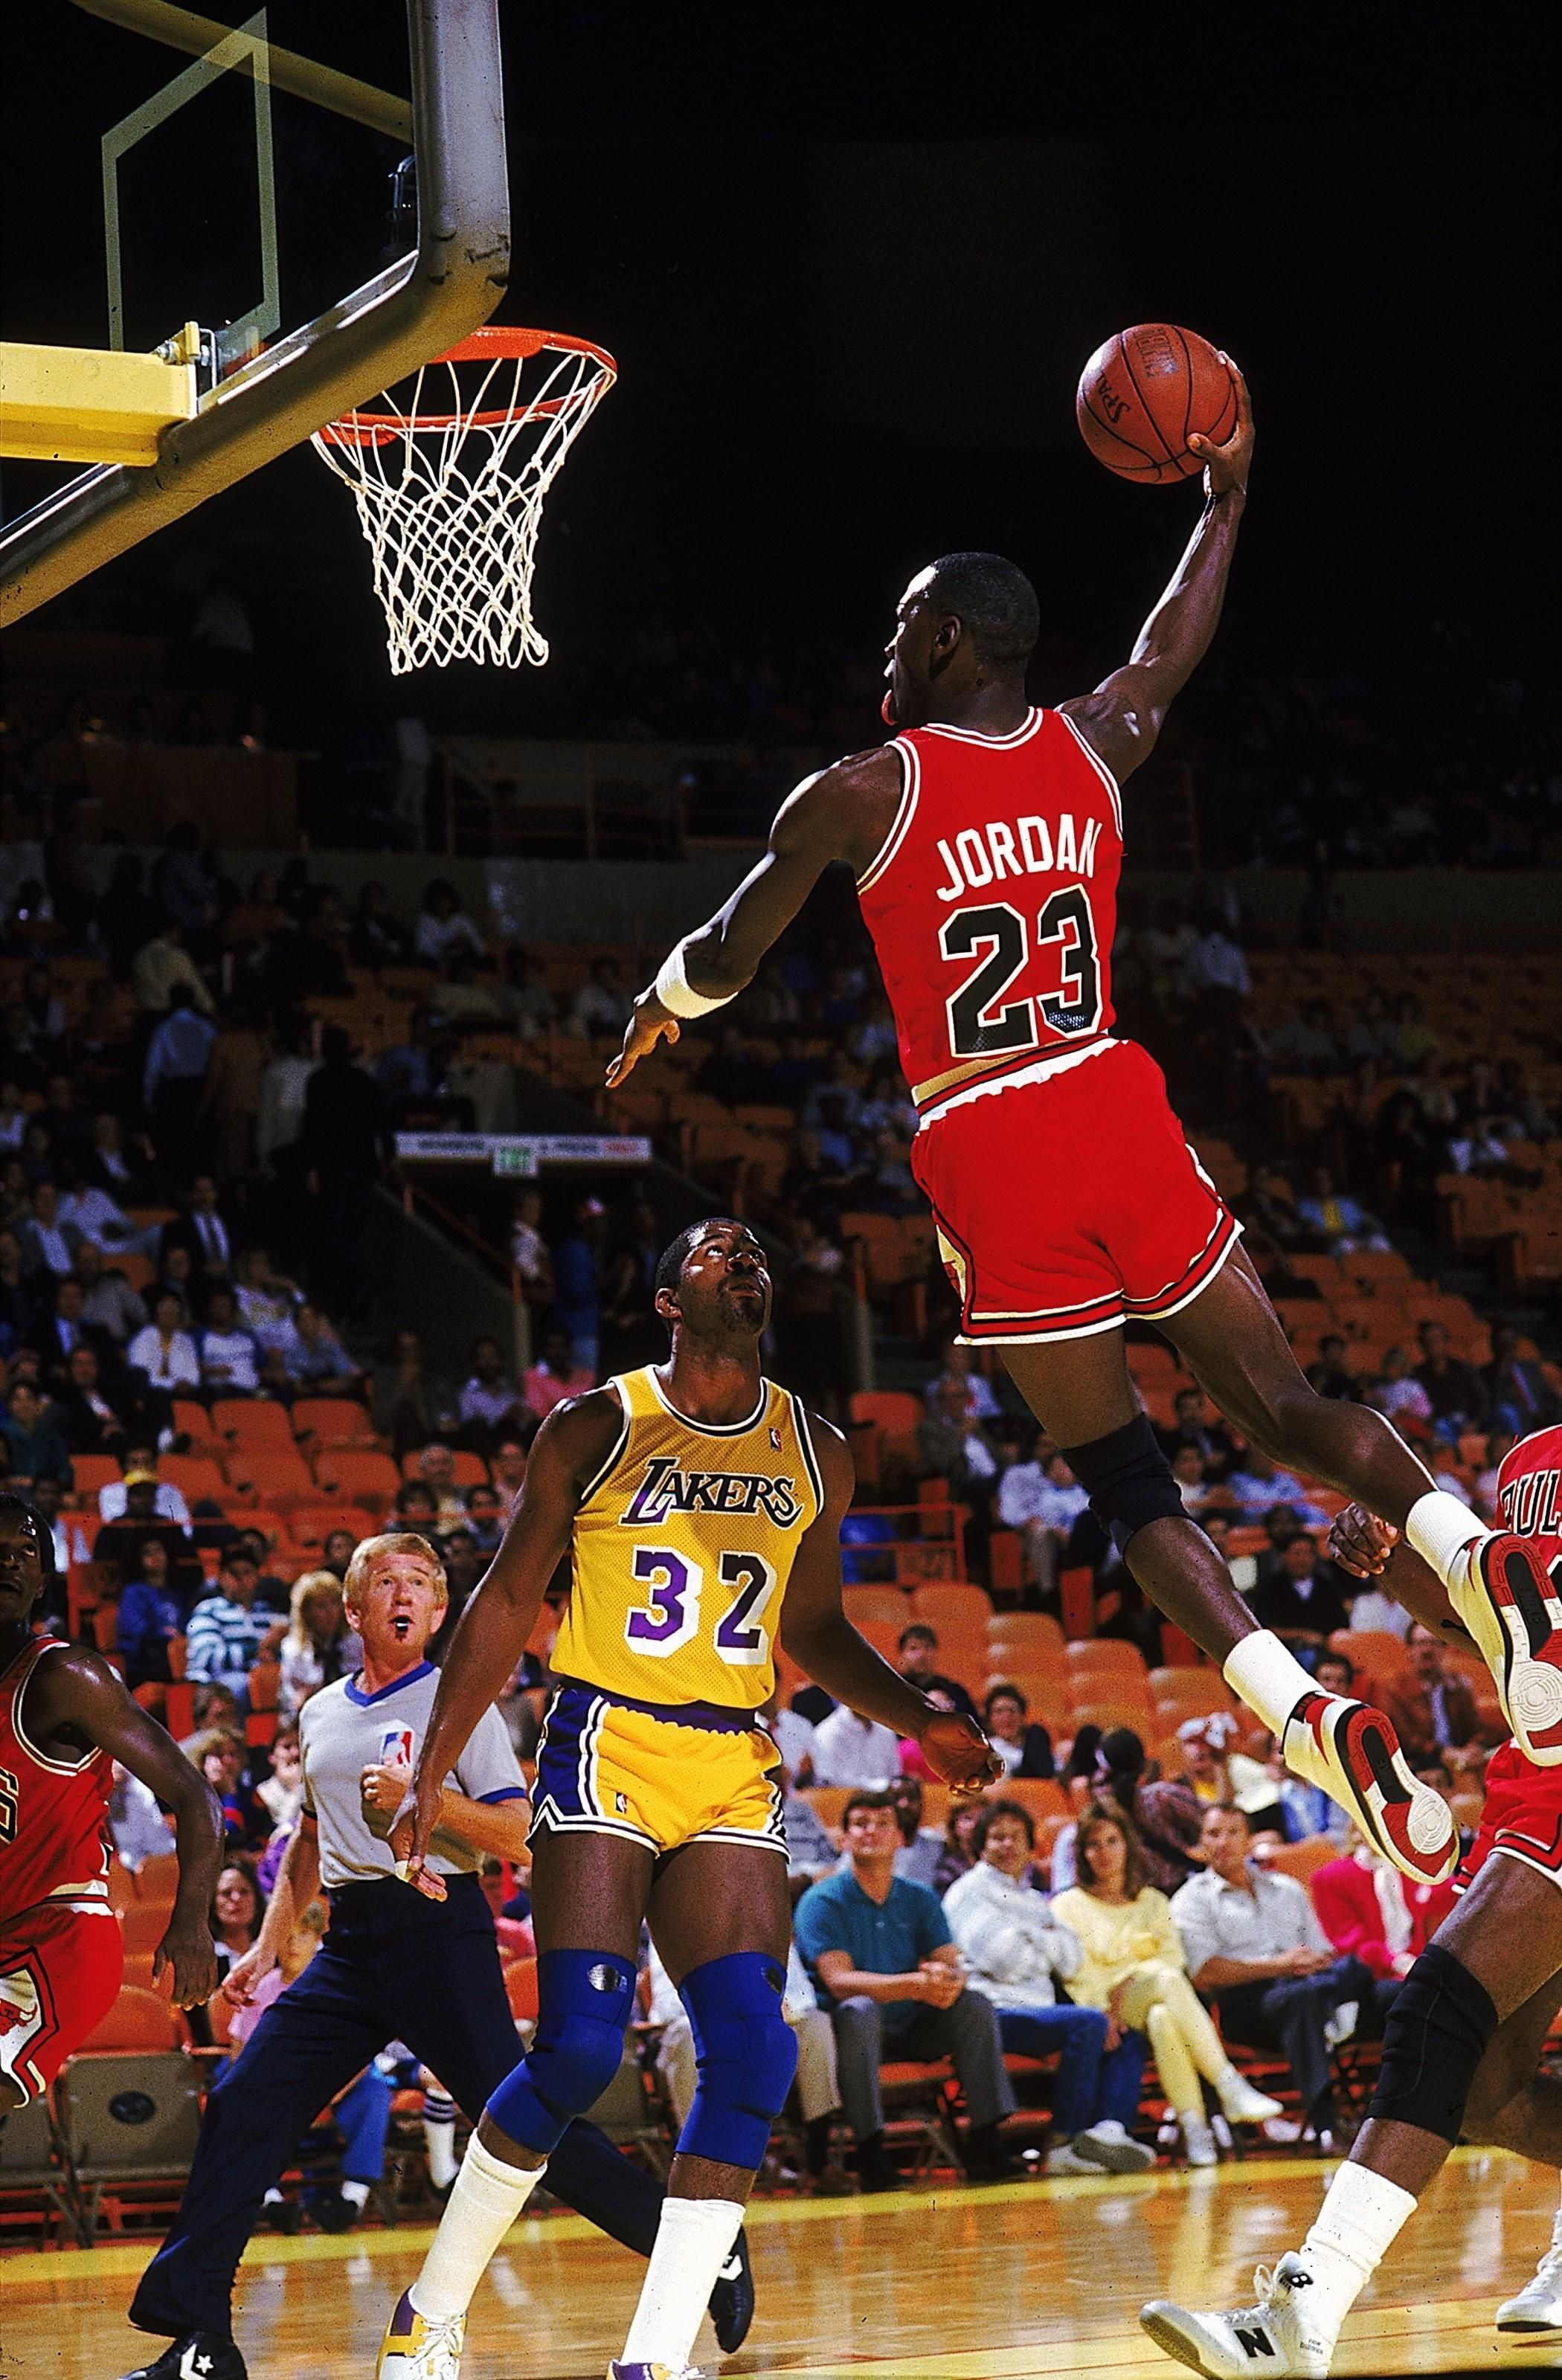 Michael Jordan Dunk Wallpapers Widescreen Festival Wallpaper Michael Jordan Chicago Bulls Michael Jordan Basketball Michael Jordan Poster